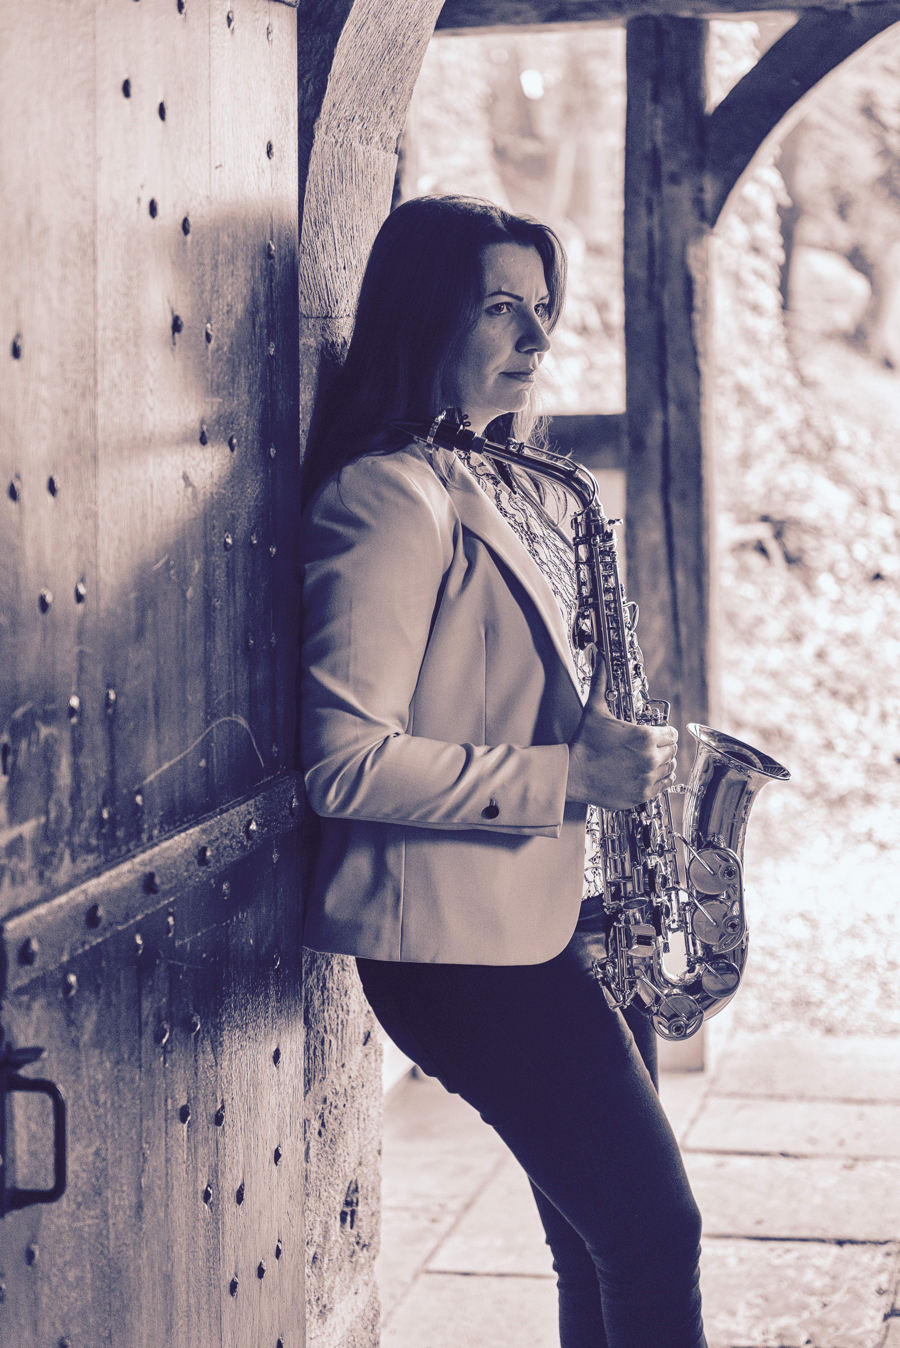 Véronique TARDIF Picture 3 - JLV Ligature Ambassador for saxophone